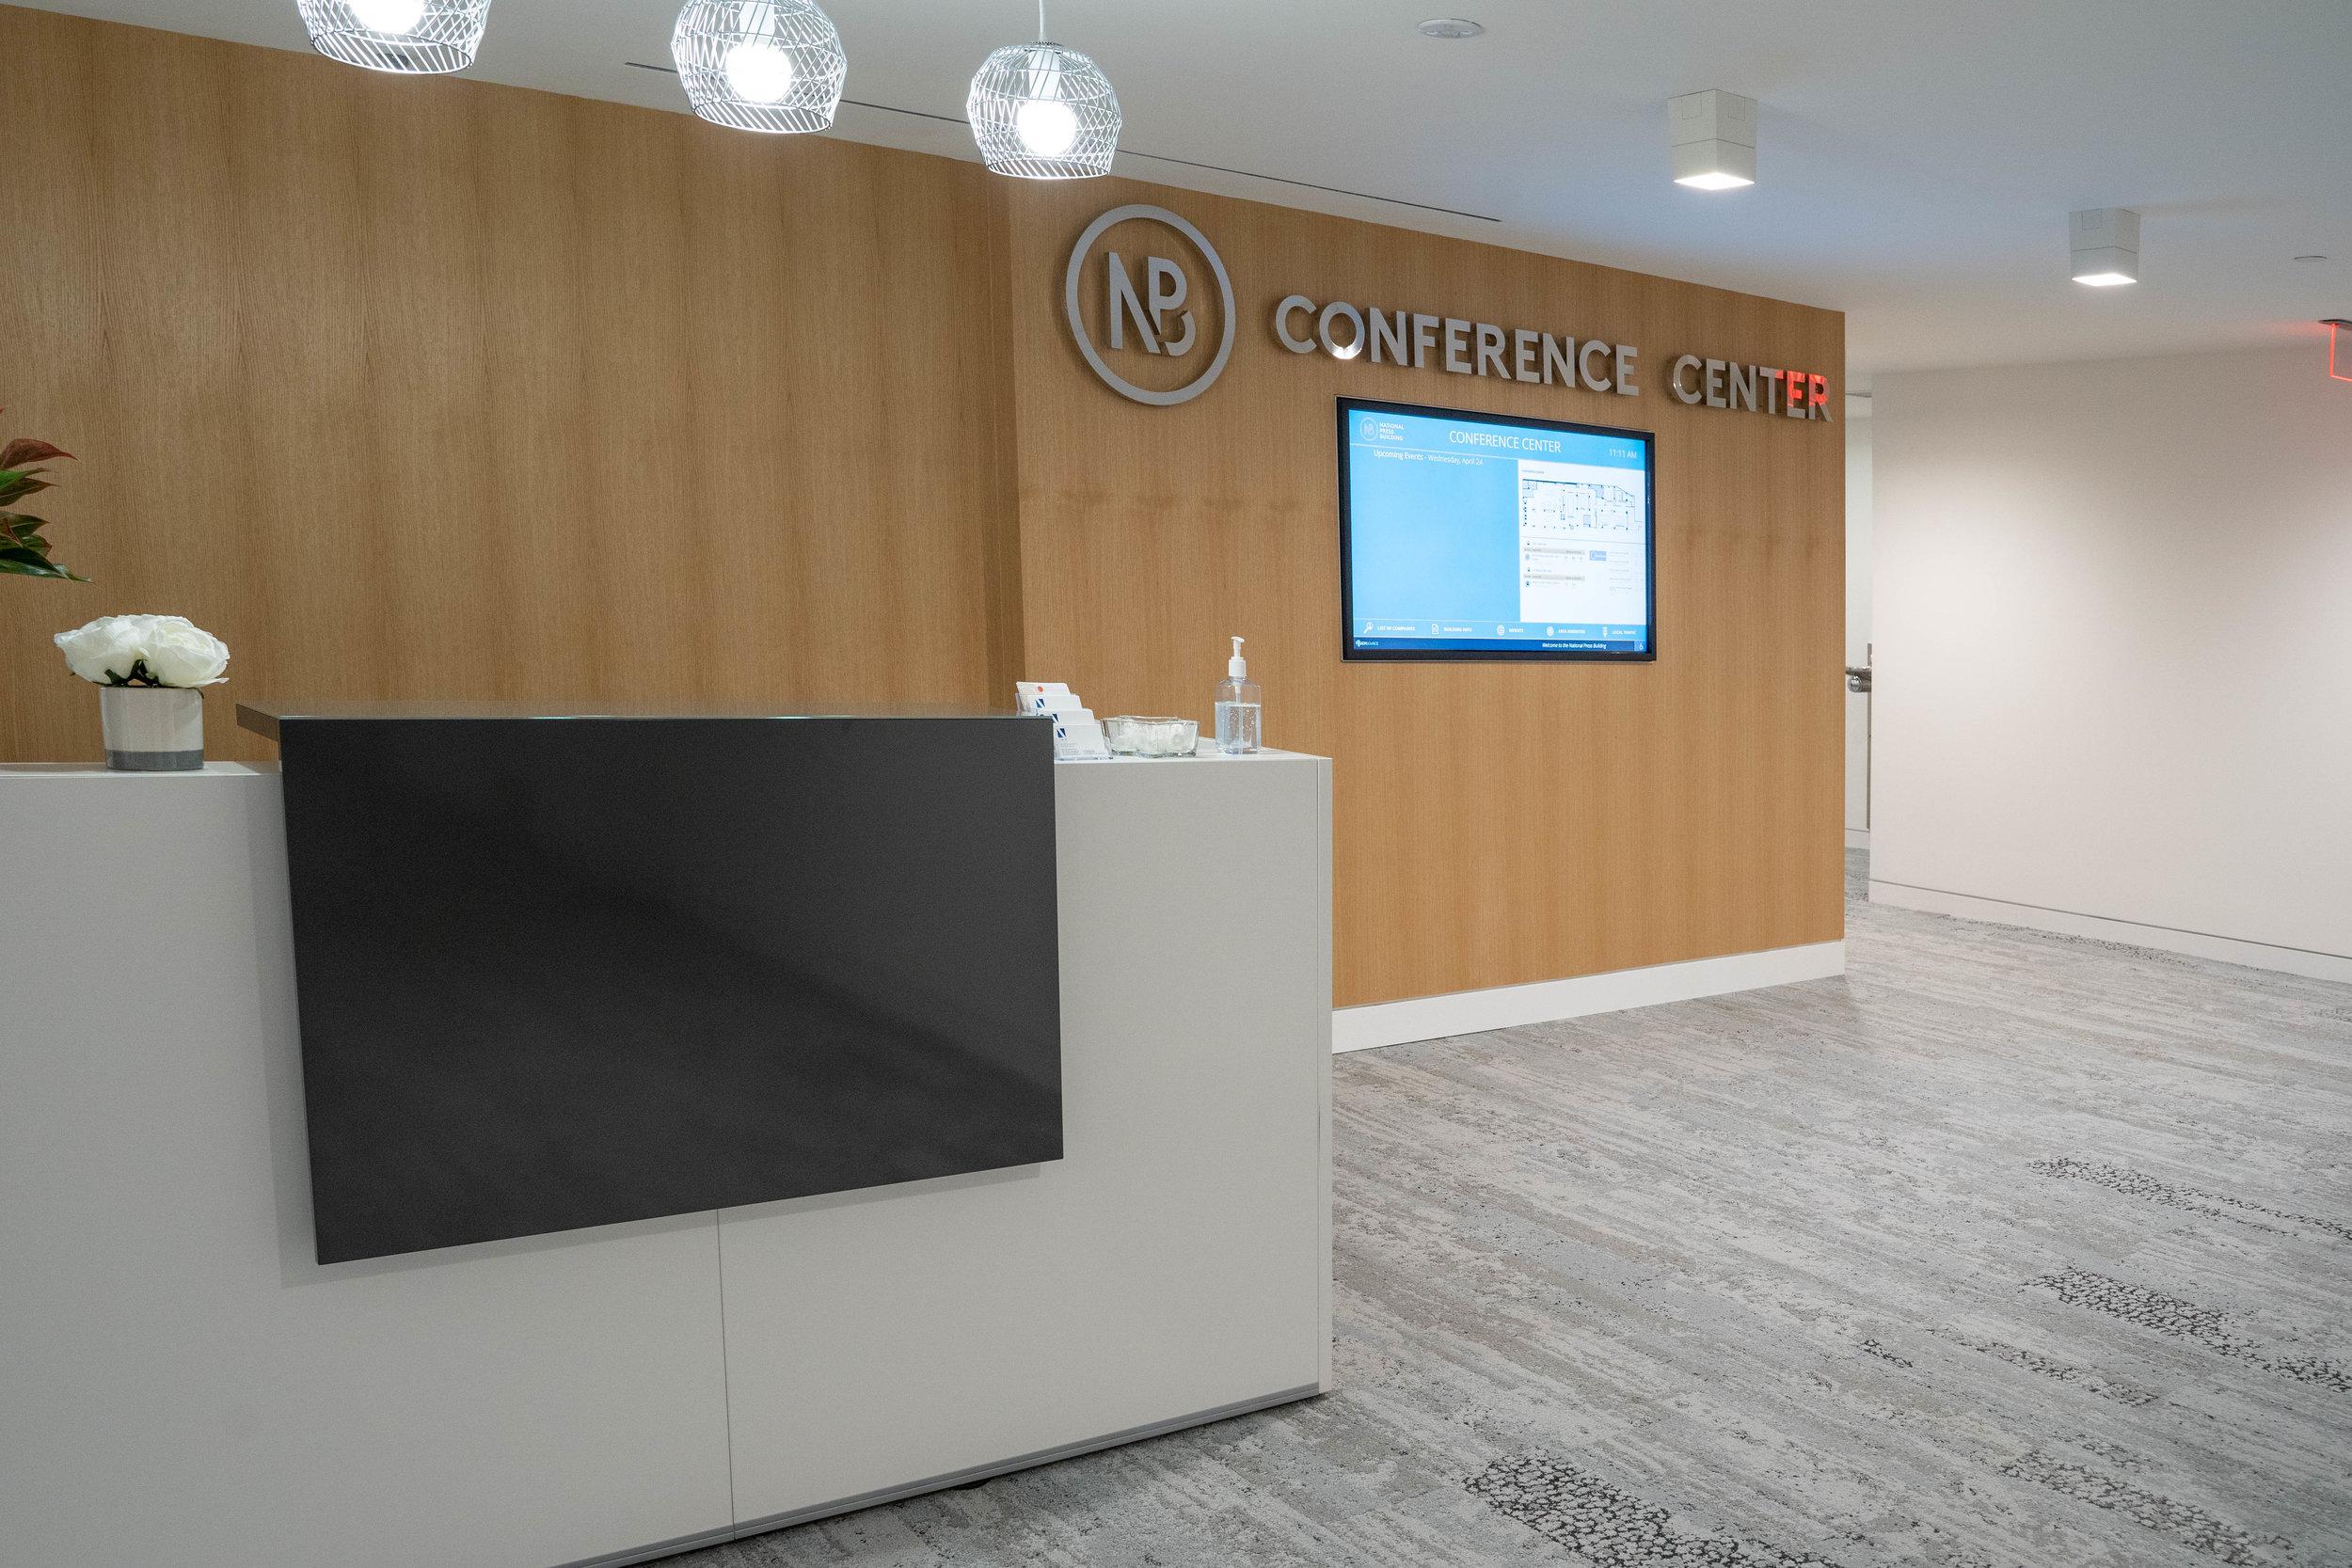 Conference Center 01.jpg